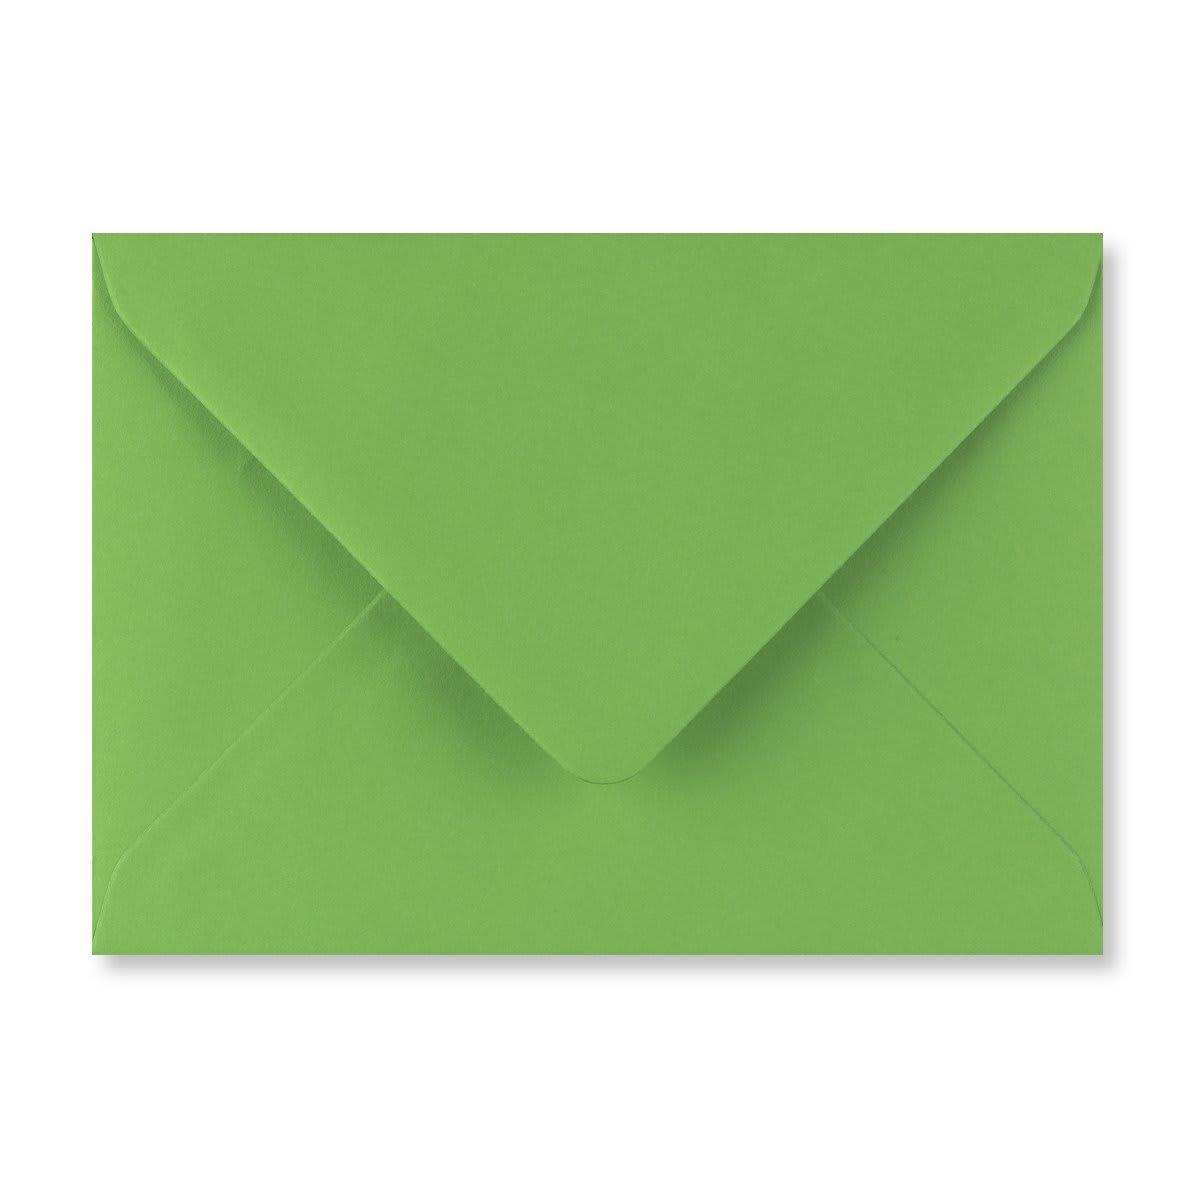 C6 FERN GREEN ENVELOPES